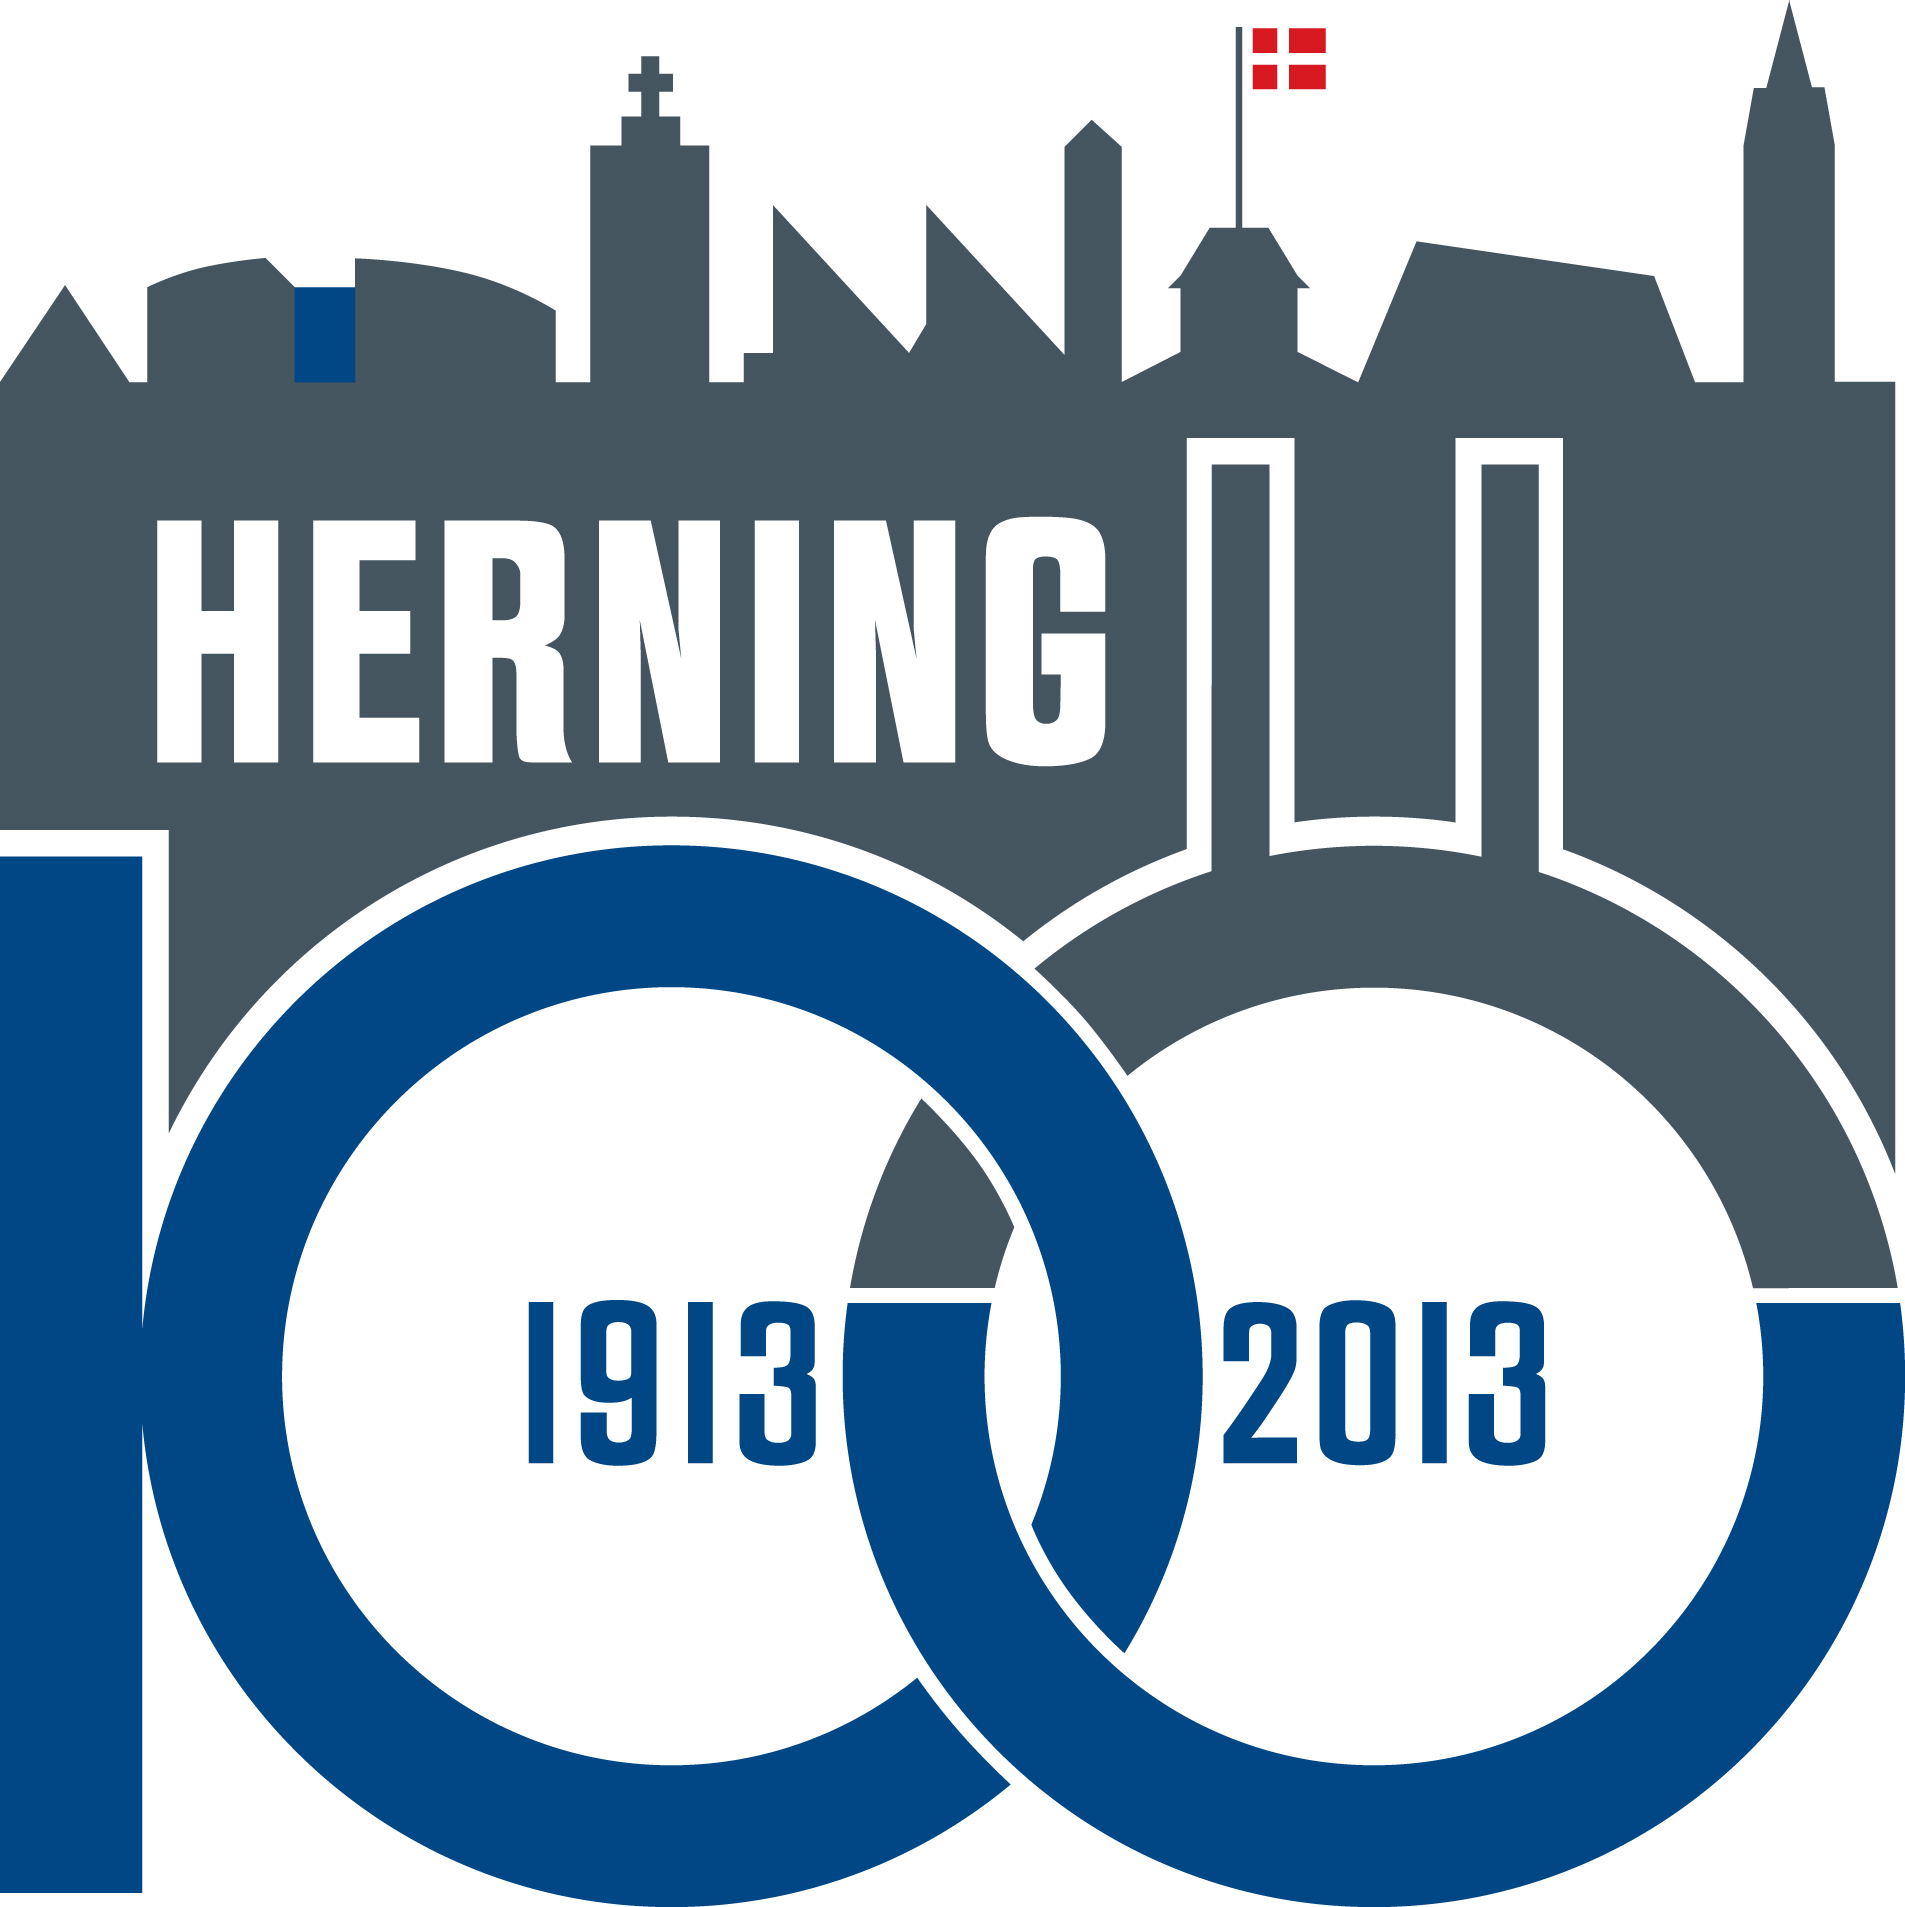 Herning100 logo